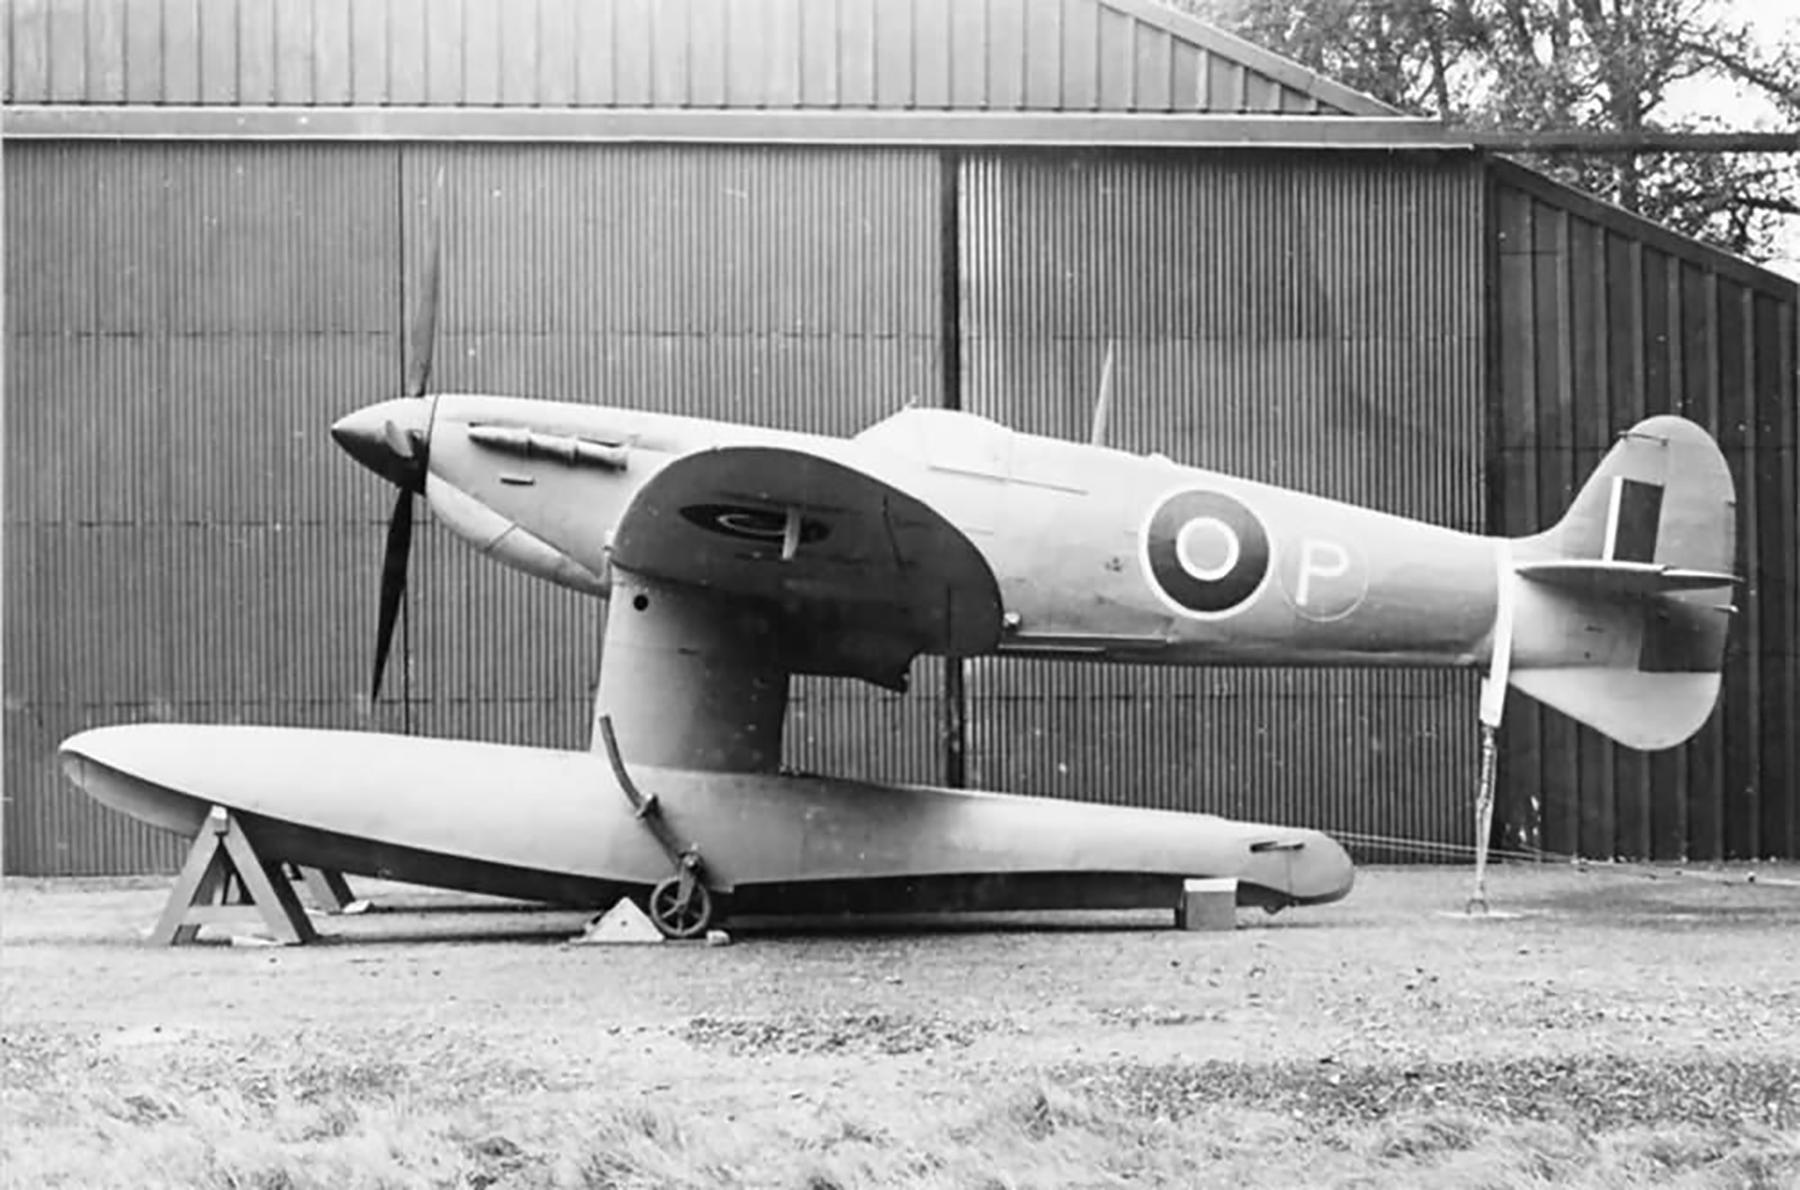 Spitfire MkV Prototype Floatplane W3760 England web 01